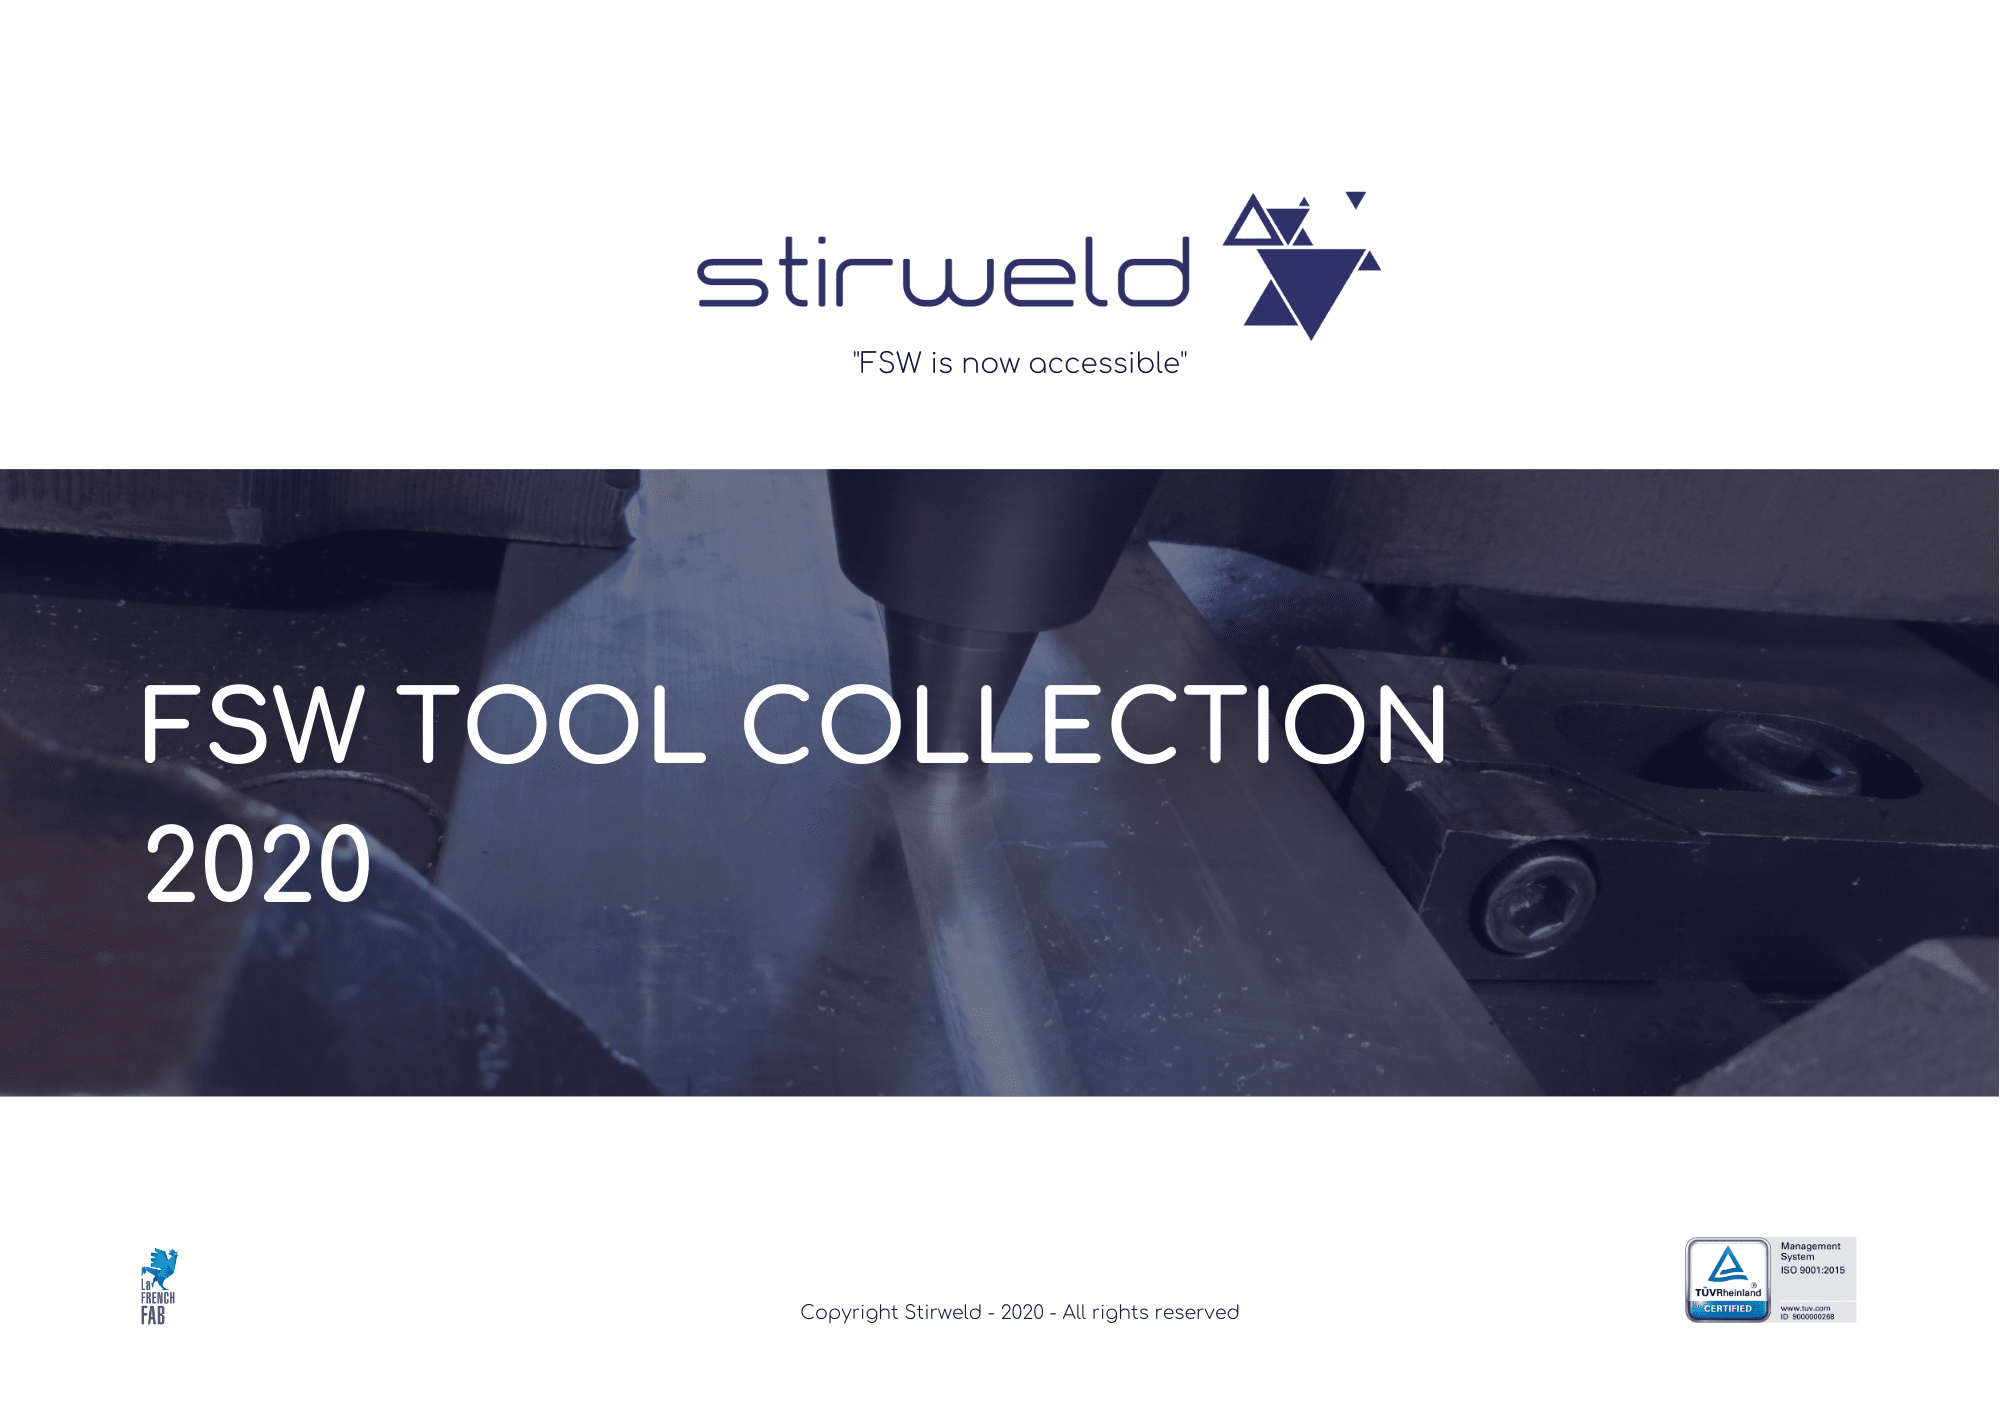 FSW-Werkzeuge